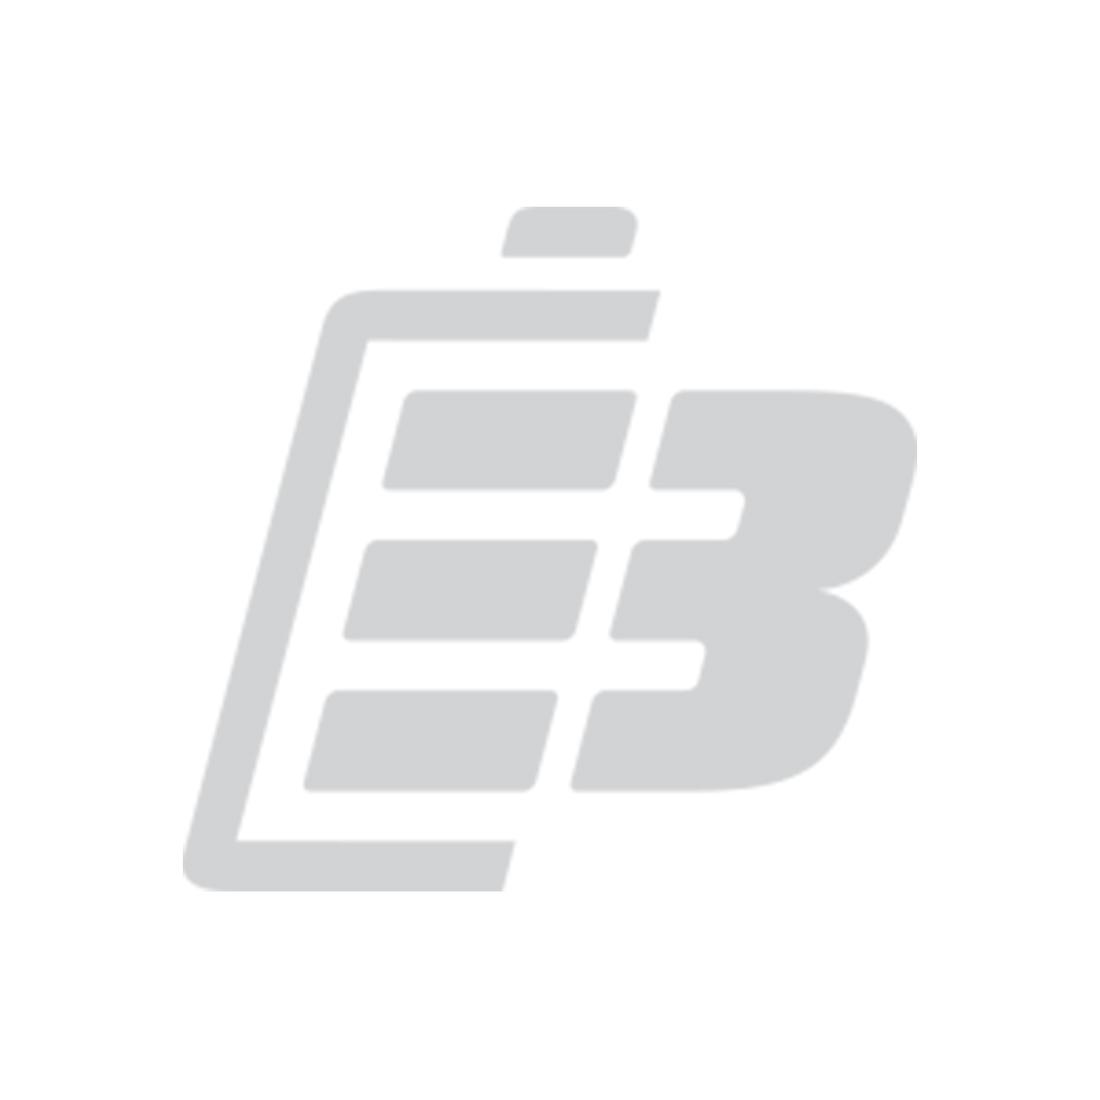 Camera battery charger Panasonic CGA-S003_1